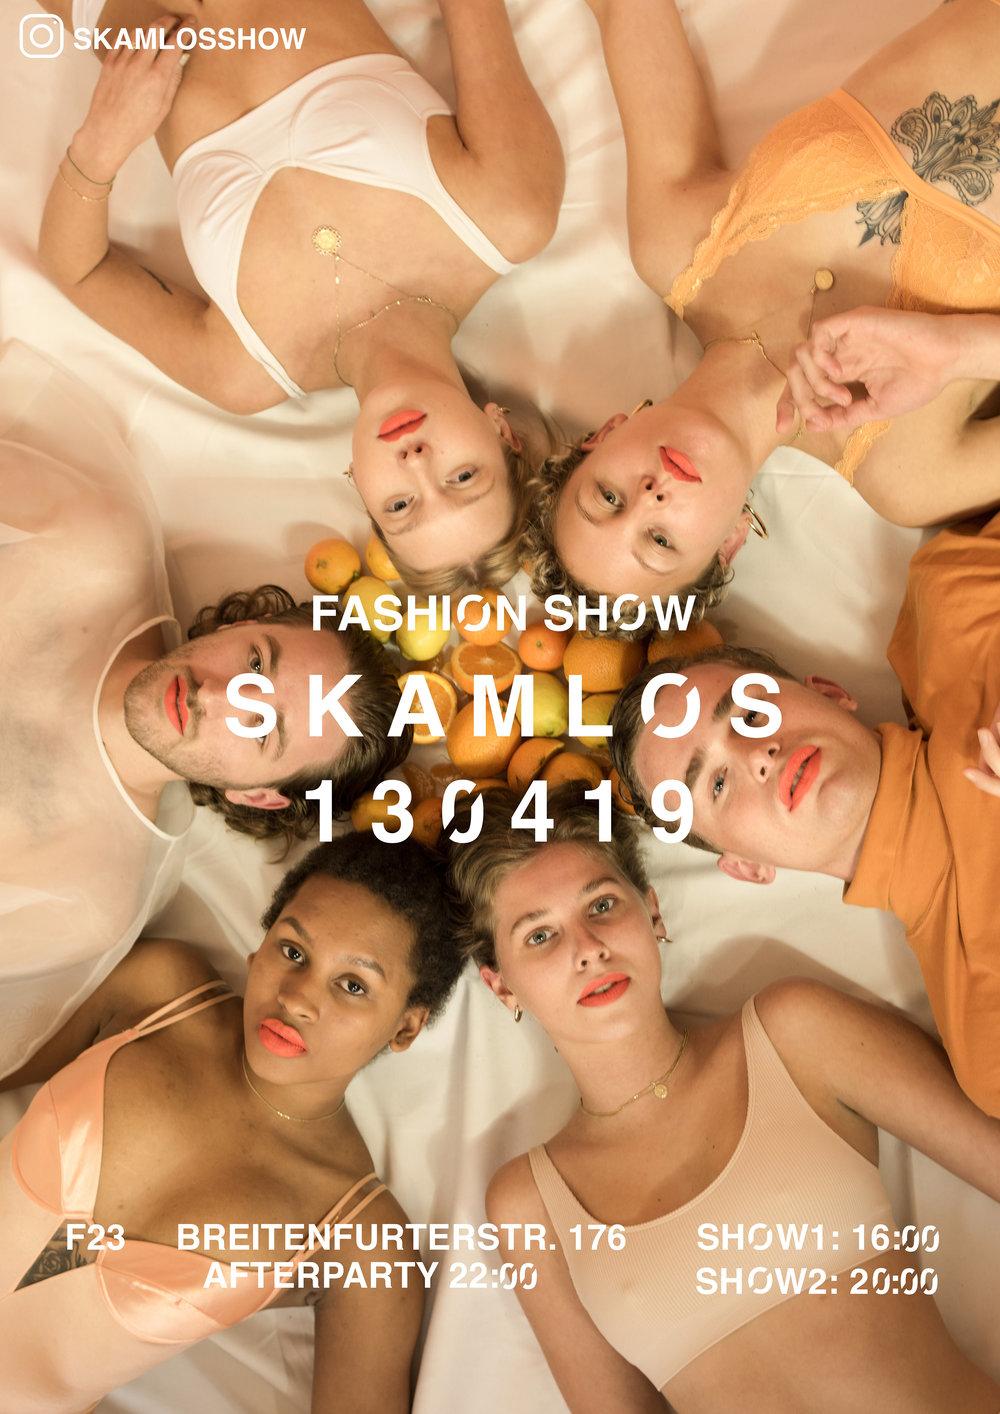 SkamlosShow02.jpg